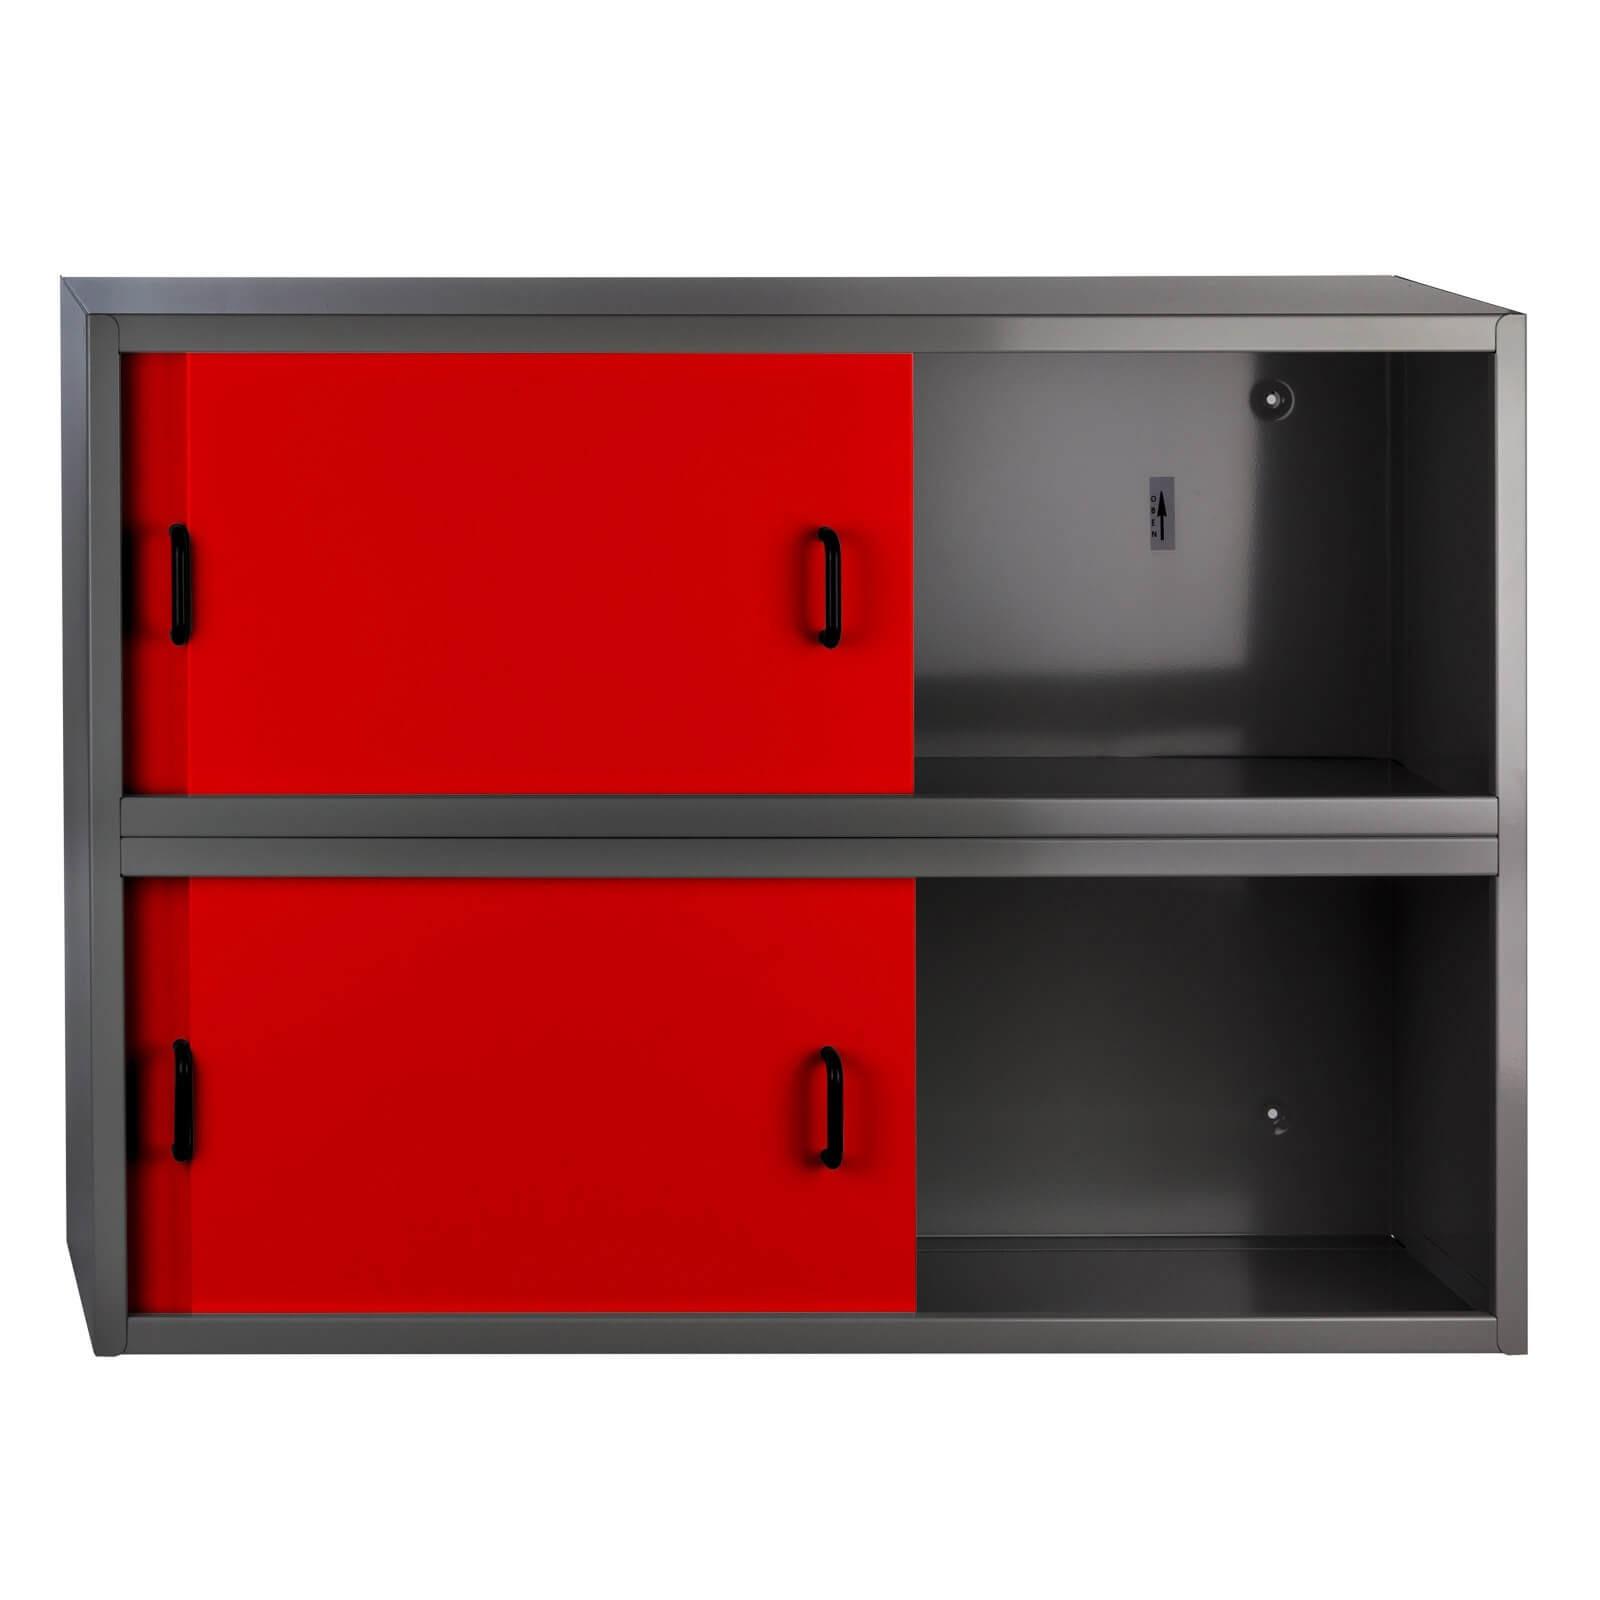 metall h ngeschrank wandschrank fernando 4 schiebet ren rot anthrazit. Black Bedroom Furniture Sets. Home Design Ideas